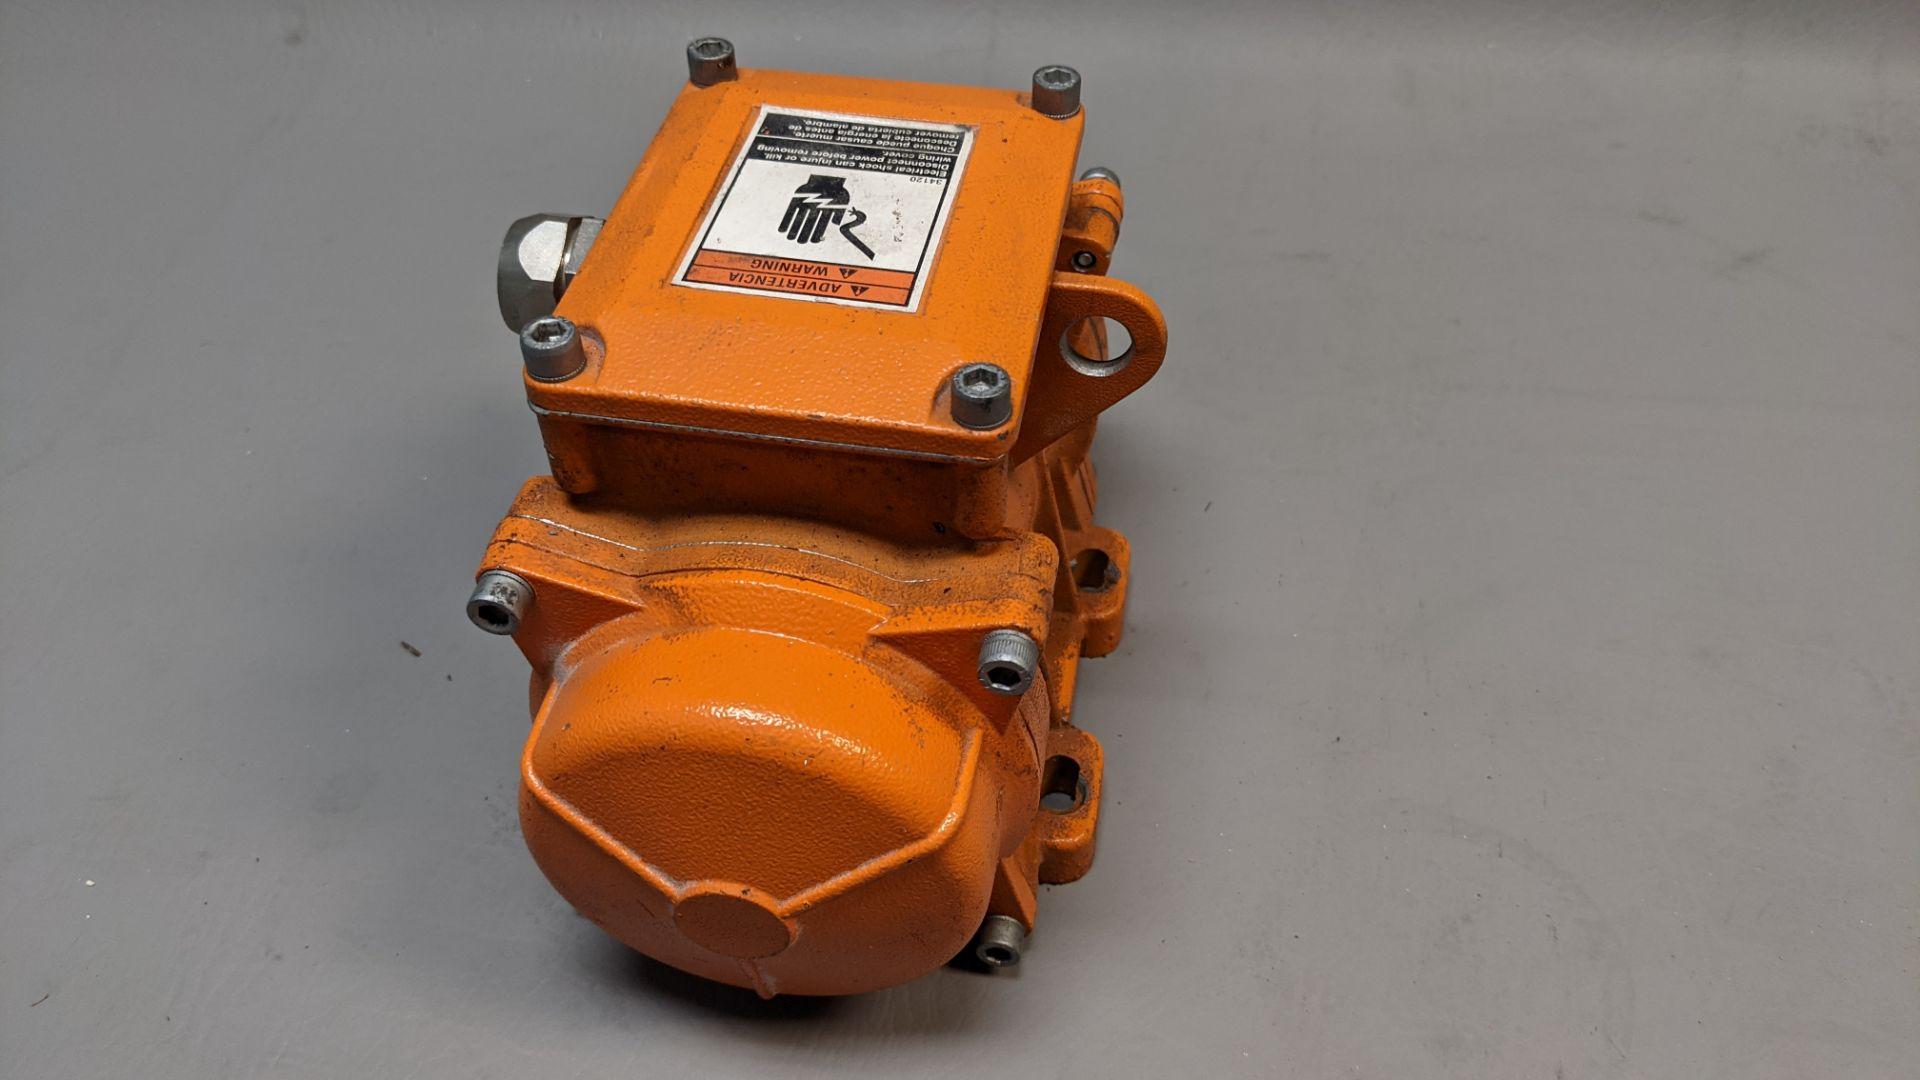 MARTIN ENGINEERING INDUSTRIAL VIBRATOR - Image 3 of 3